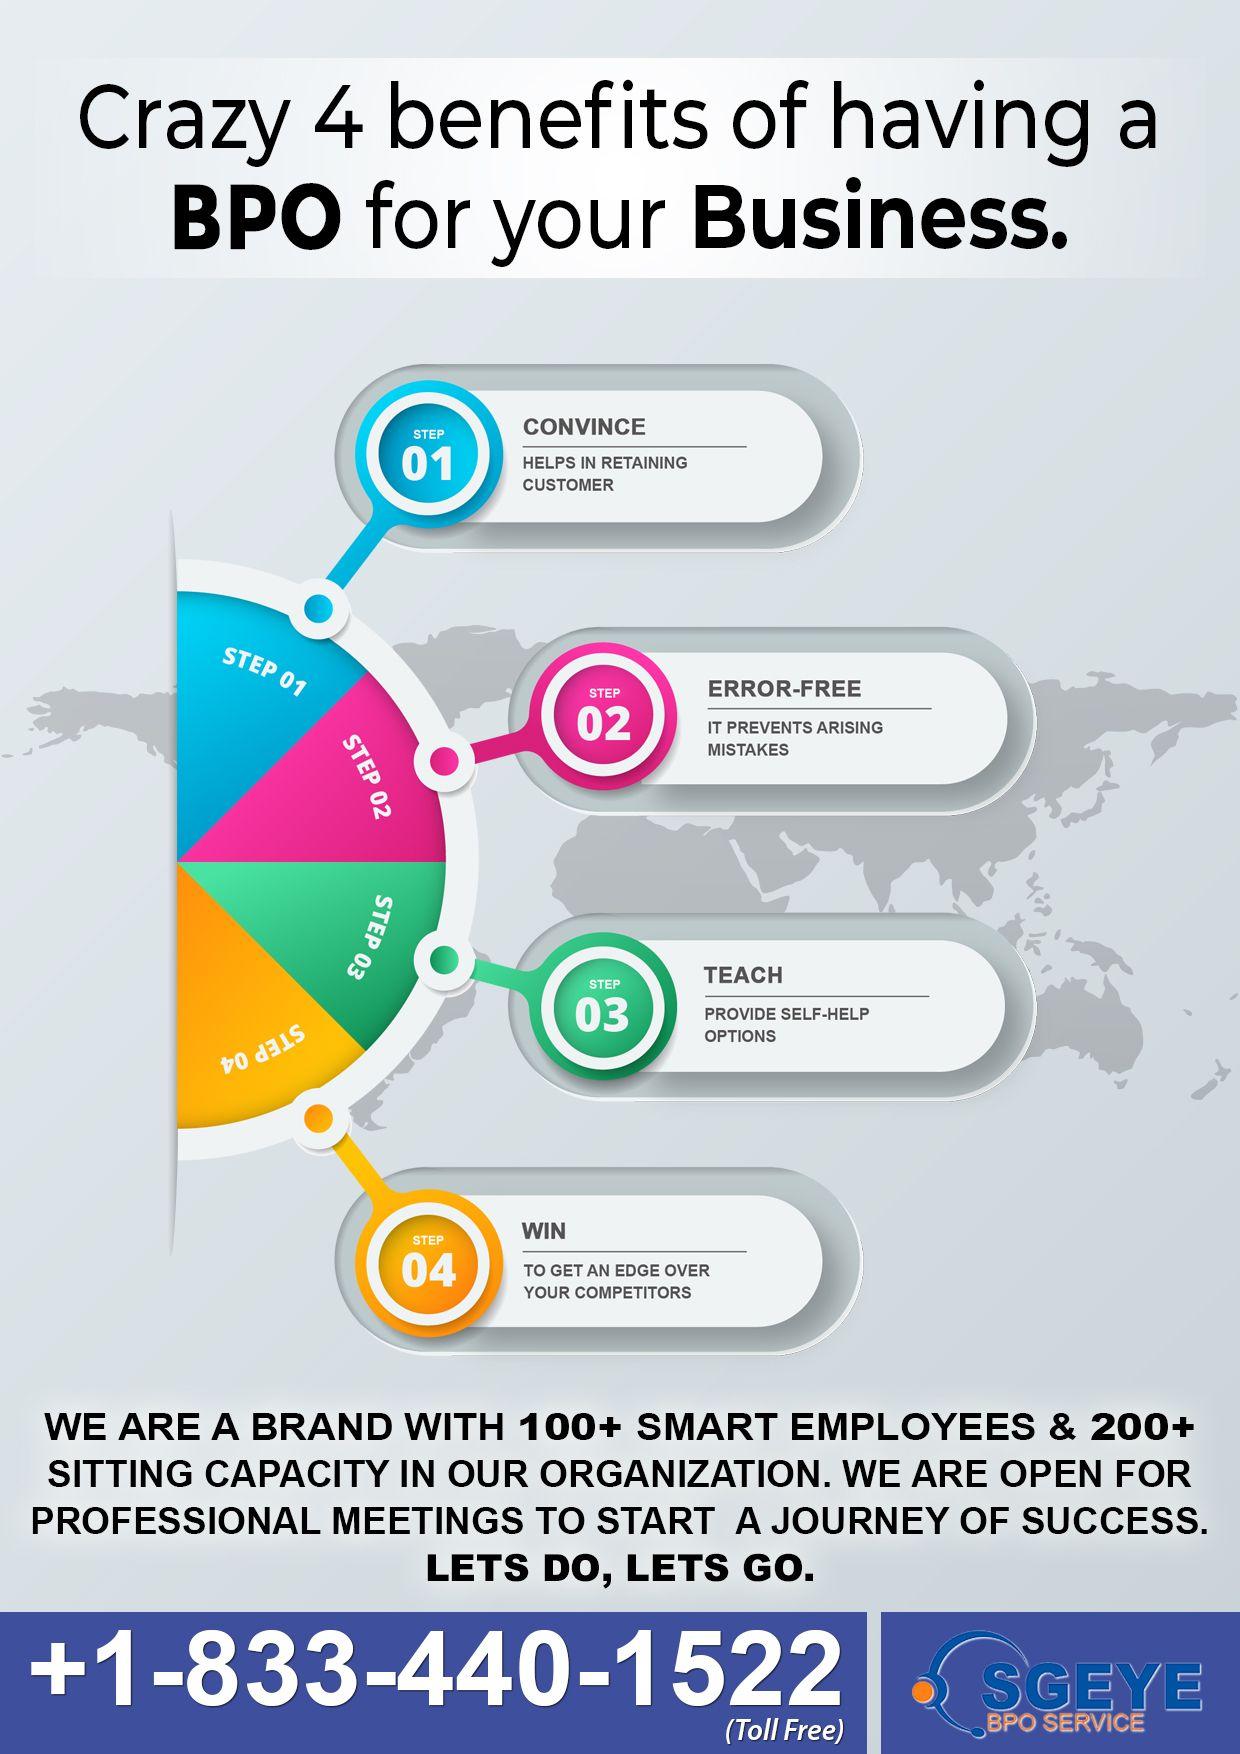 SGEYE BPO Service Bpo, Business, Effective communication